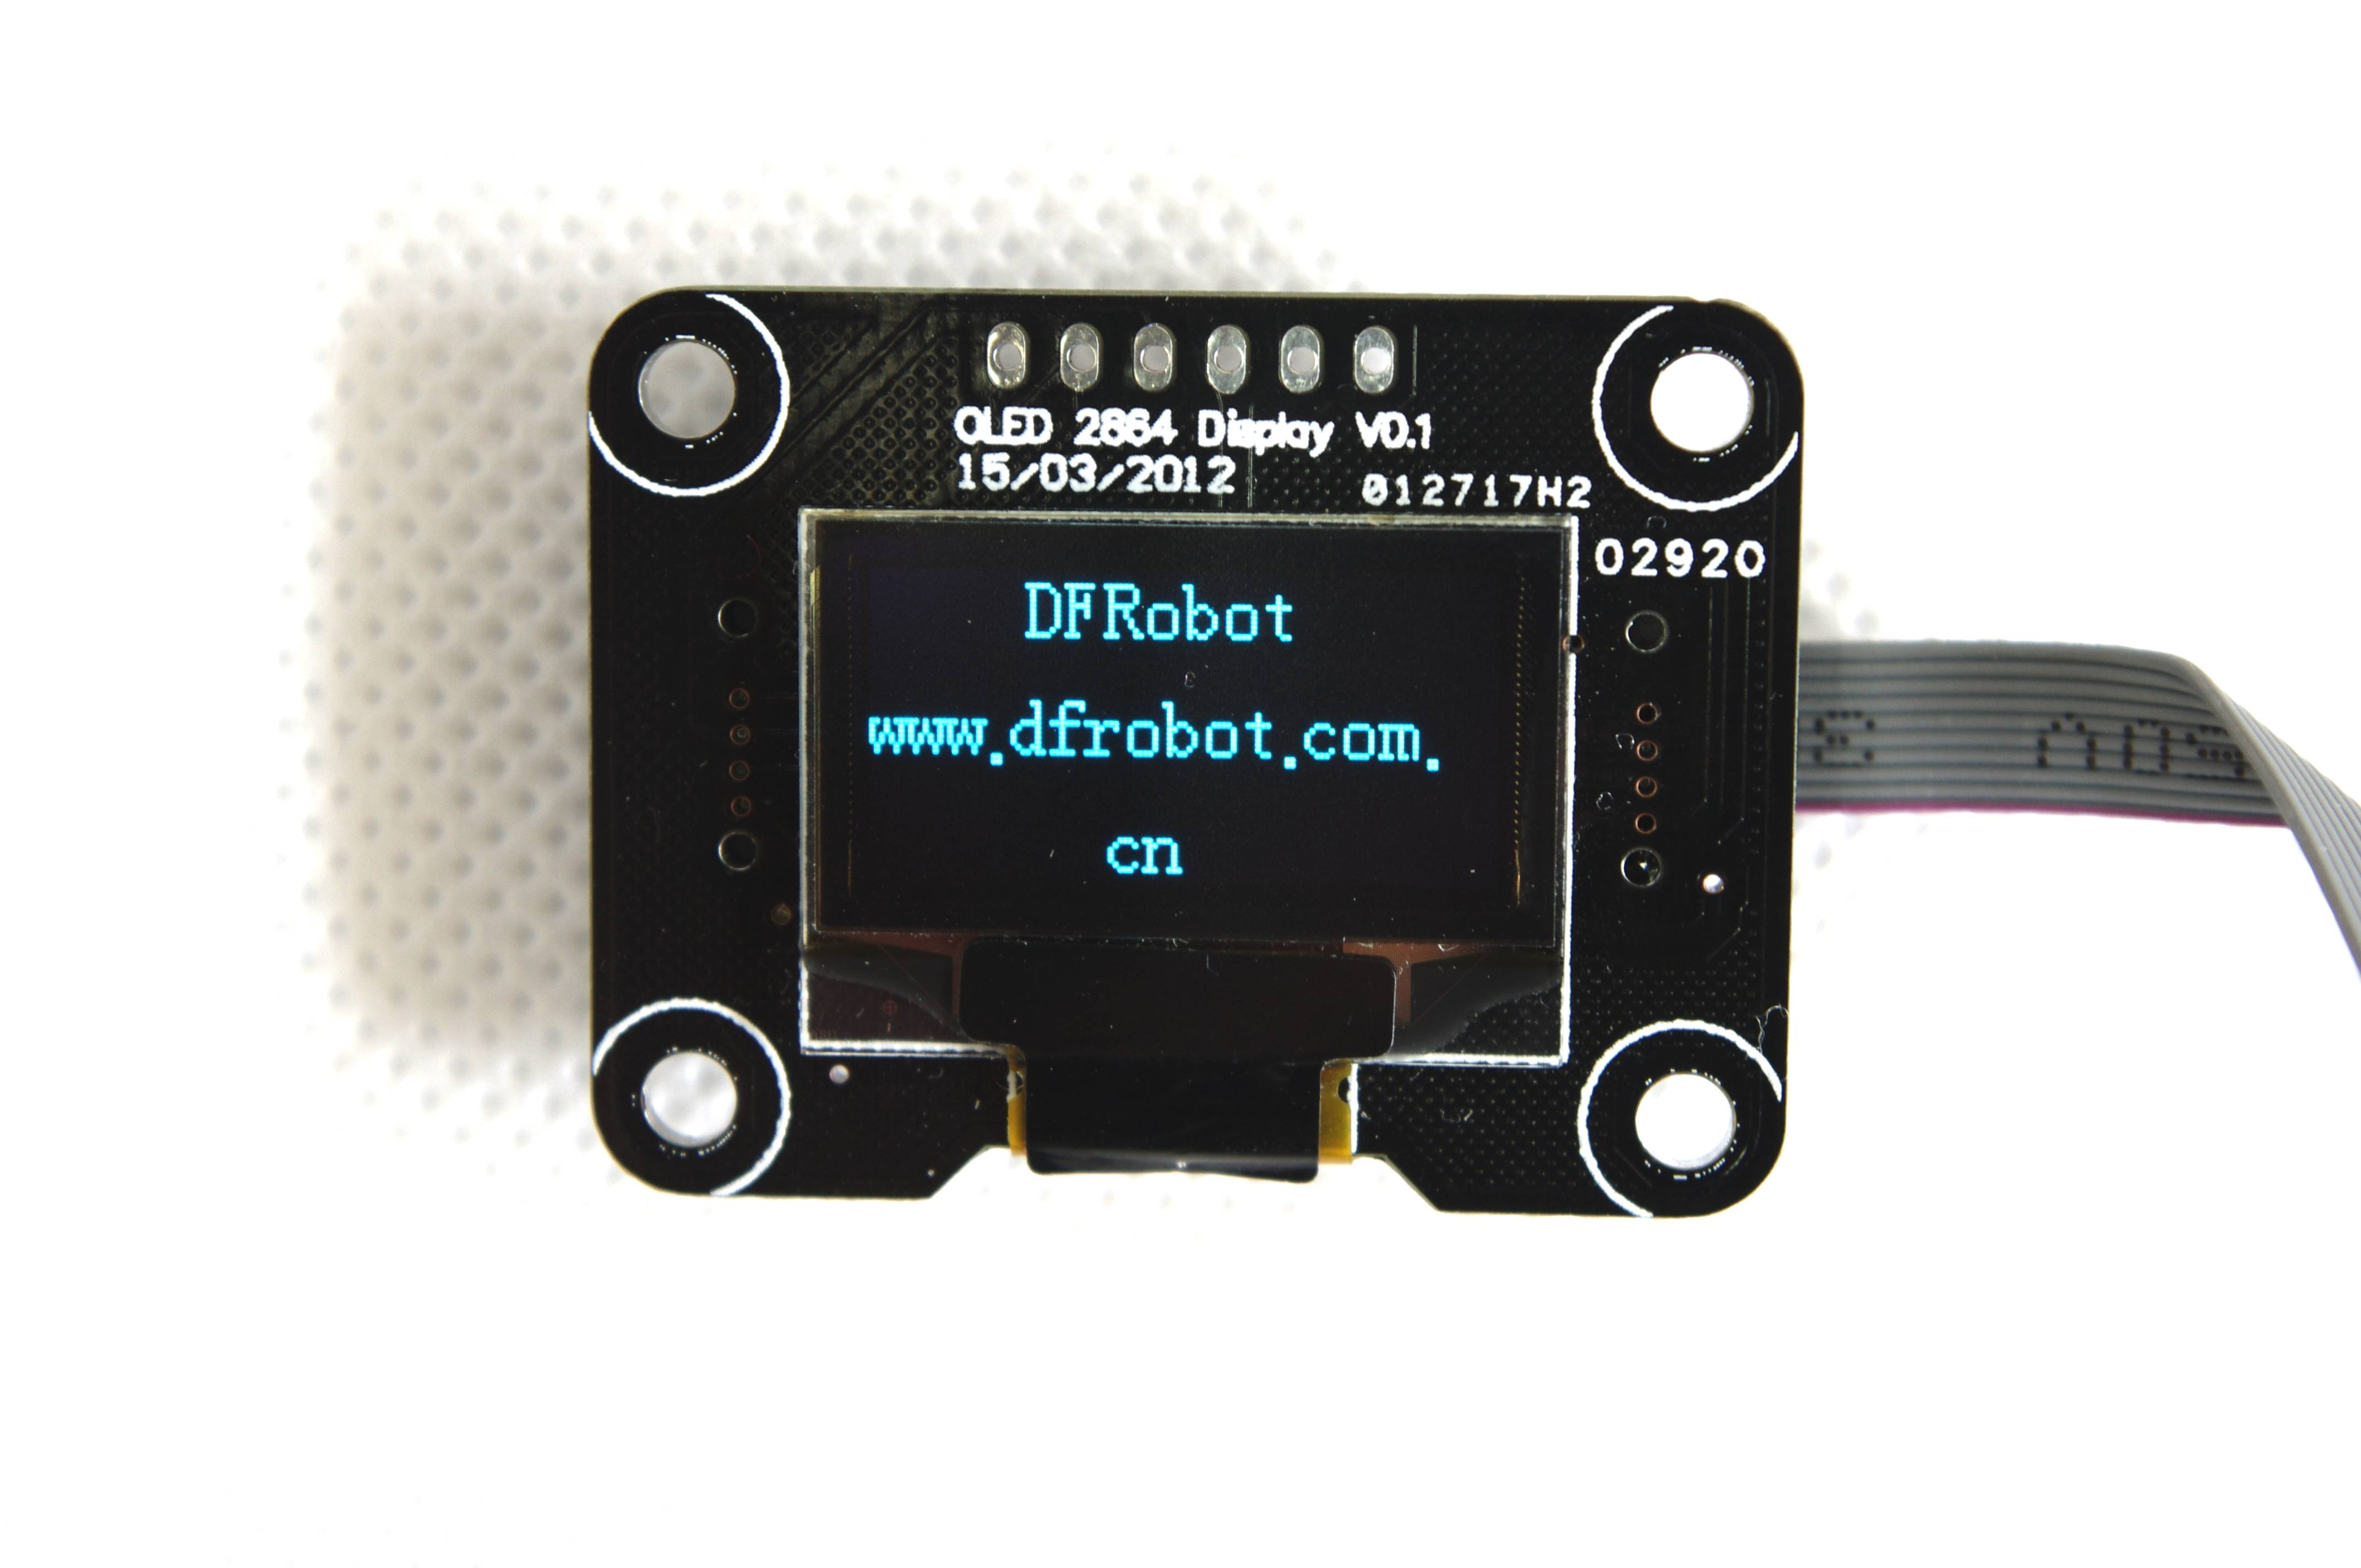 OLED 2864 display module(.NET Gadgeteer Compatible) (SKU:TOY0007)